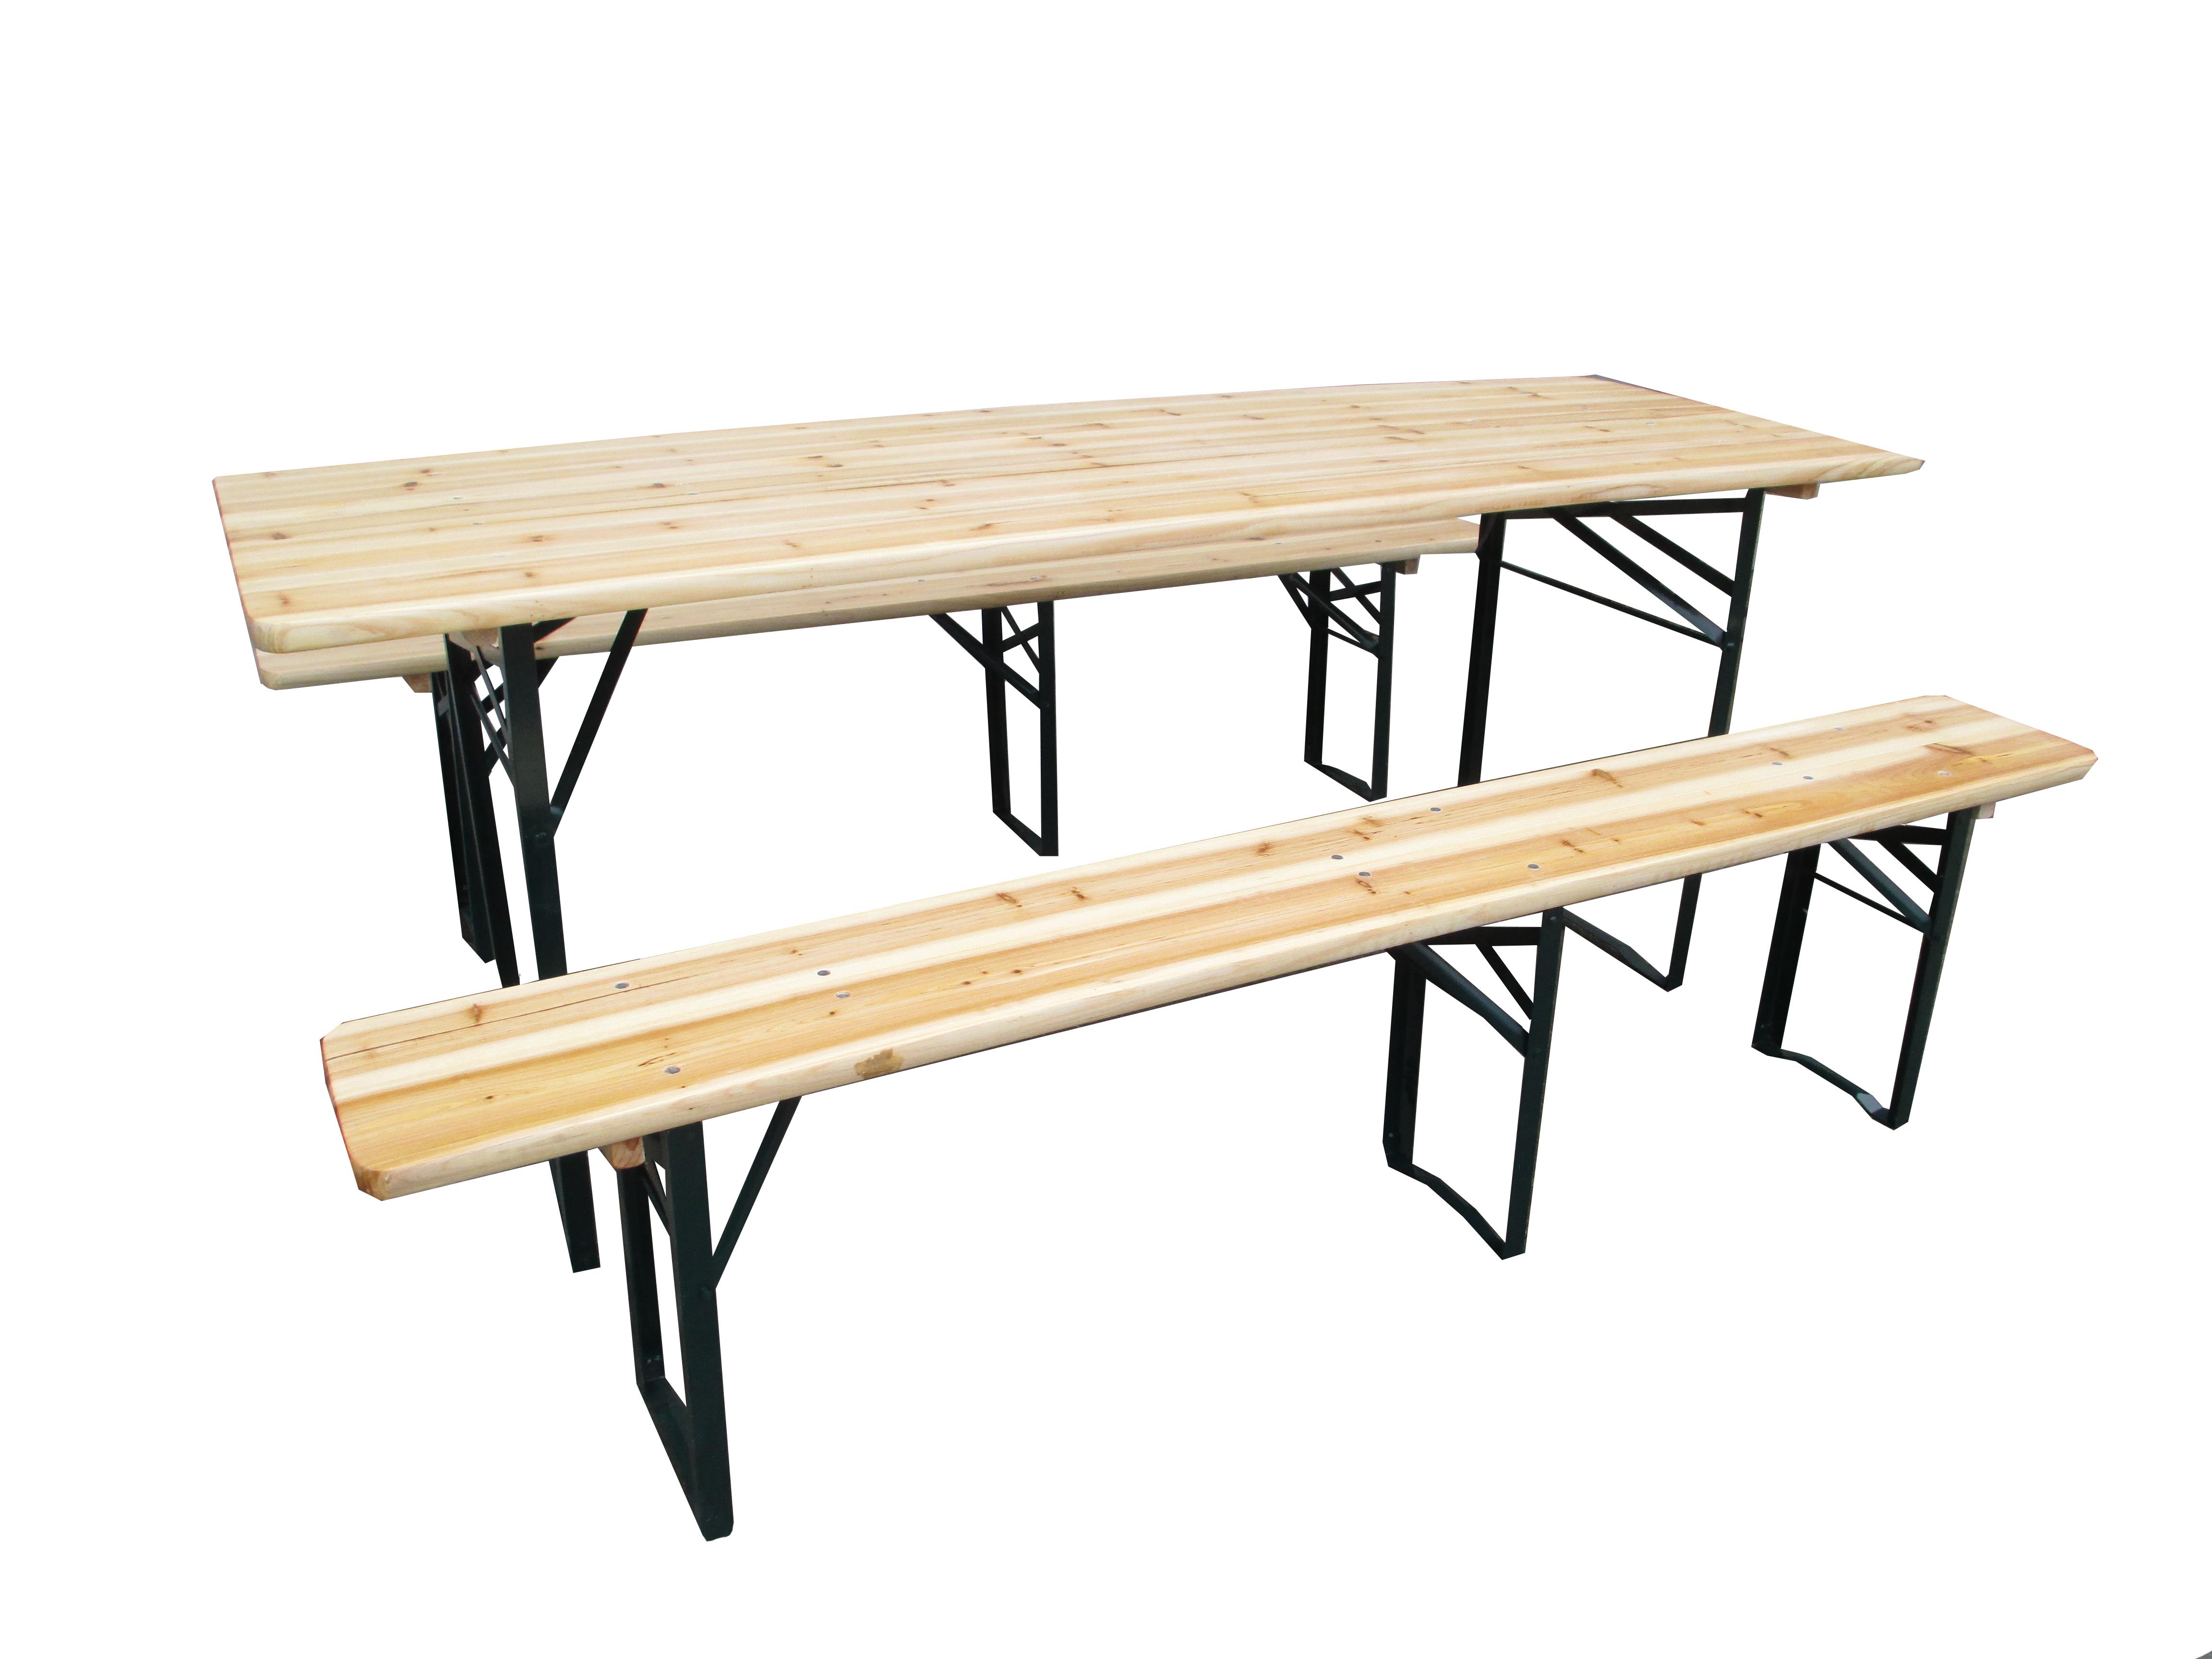 Ikea pavimento esterno pavimento esterno ikea trendy for Pavimento da esterno ikea